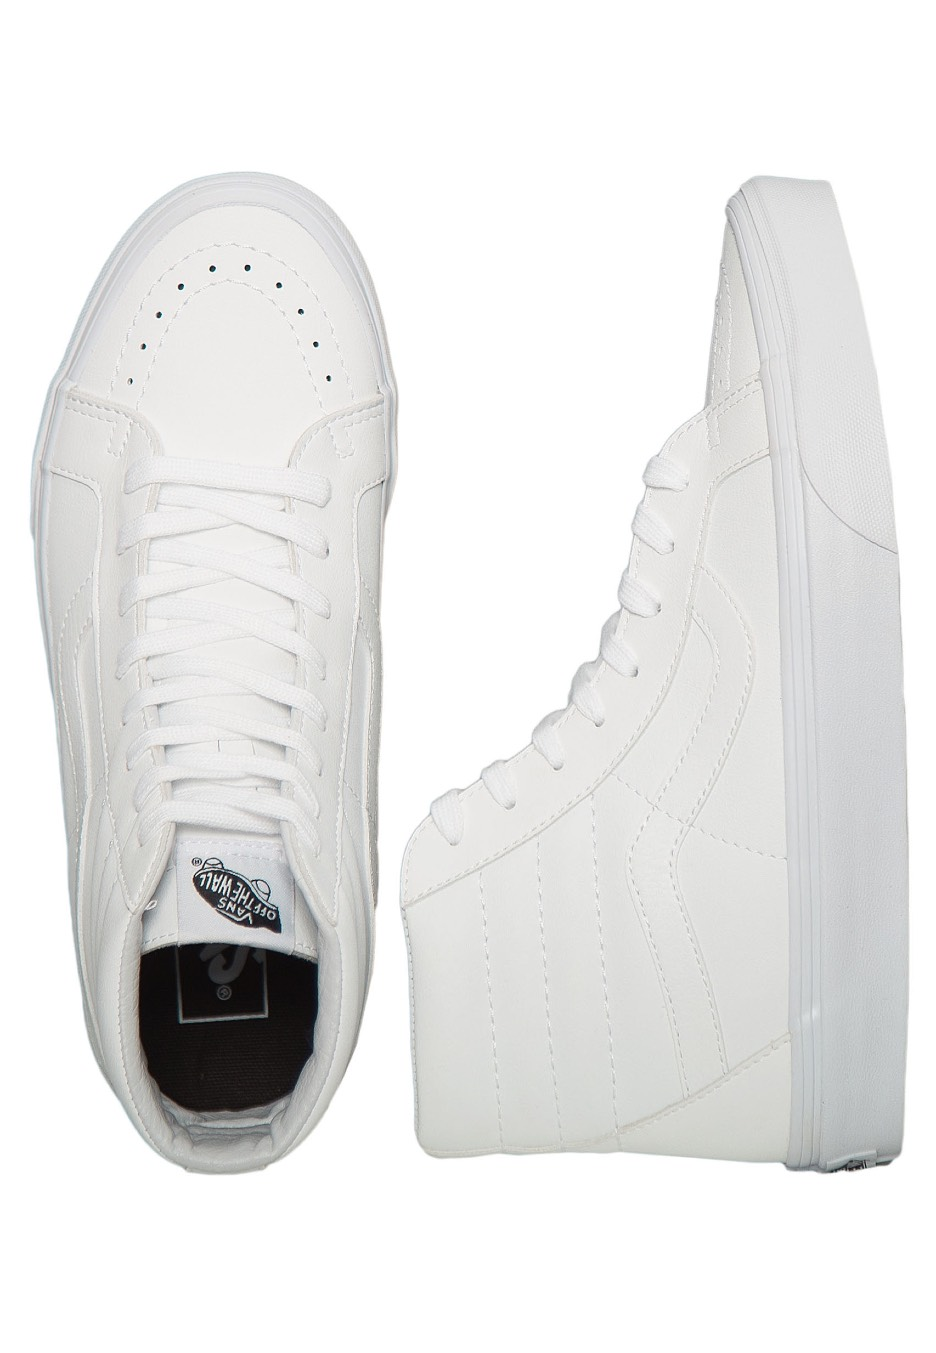 Vans - SK8‐Hi Reissue Classic Tumble True White - Shoes - Impericon ... 0c330c26f21